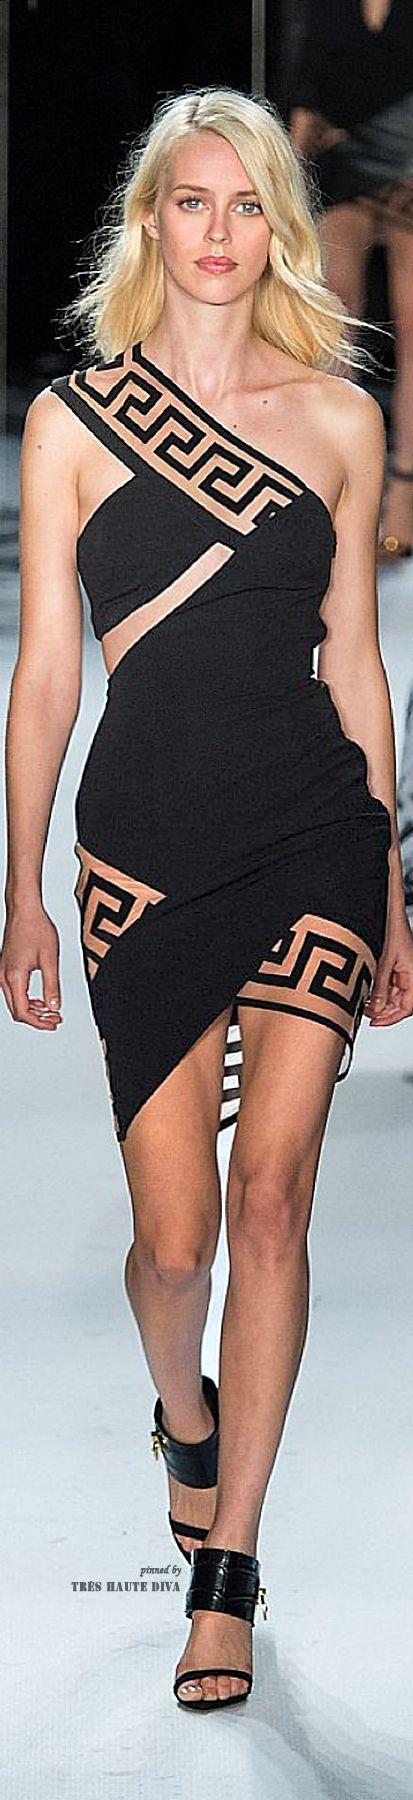 Modern Goddess / karen cox | Santorini | Versus Versace SS 2015 RTW | cynthia reccord